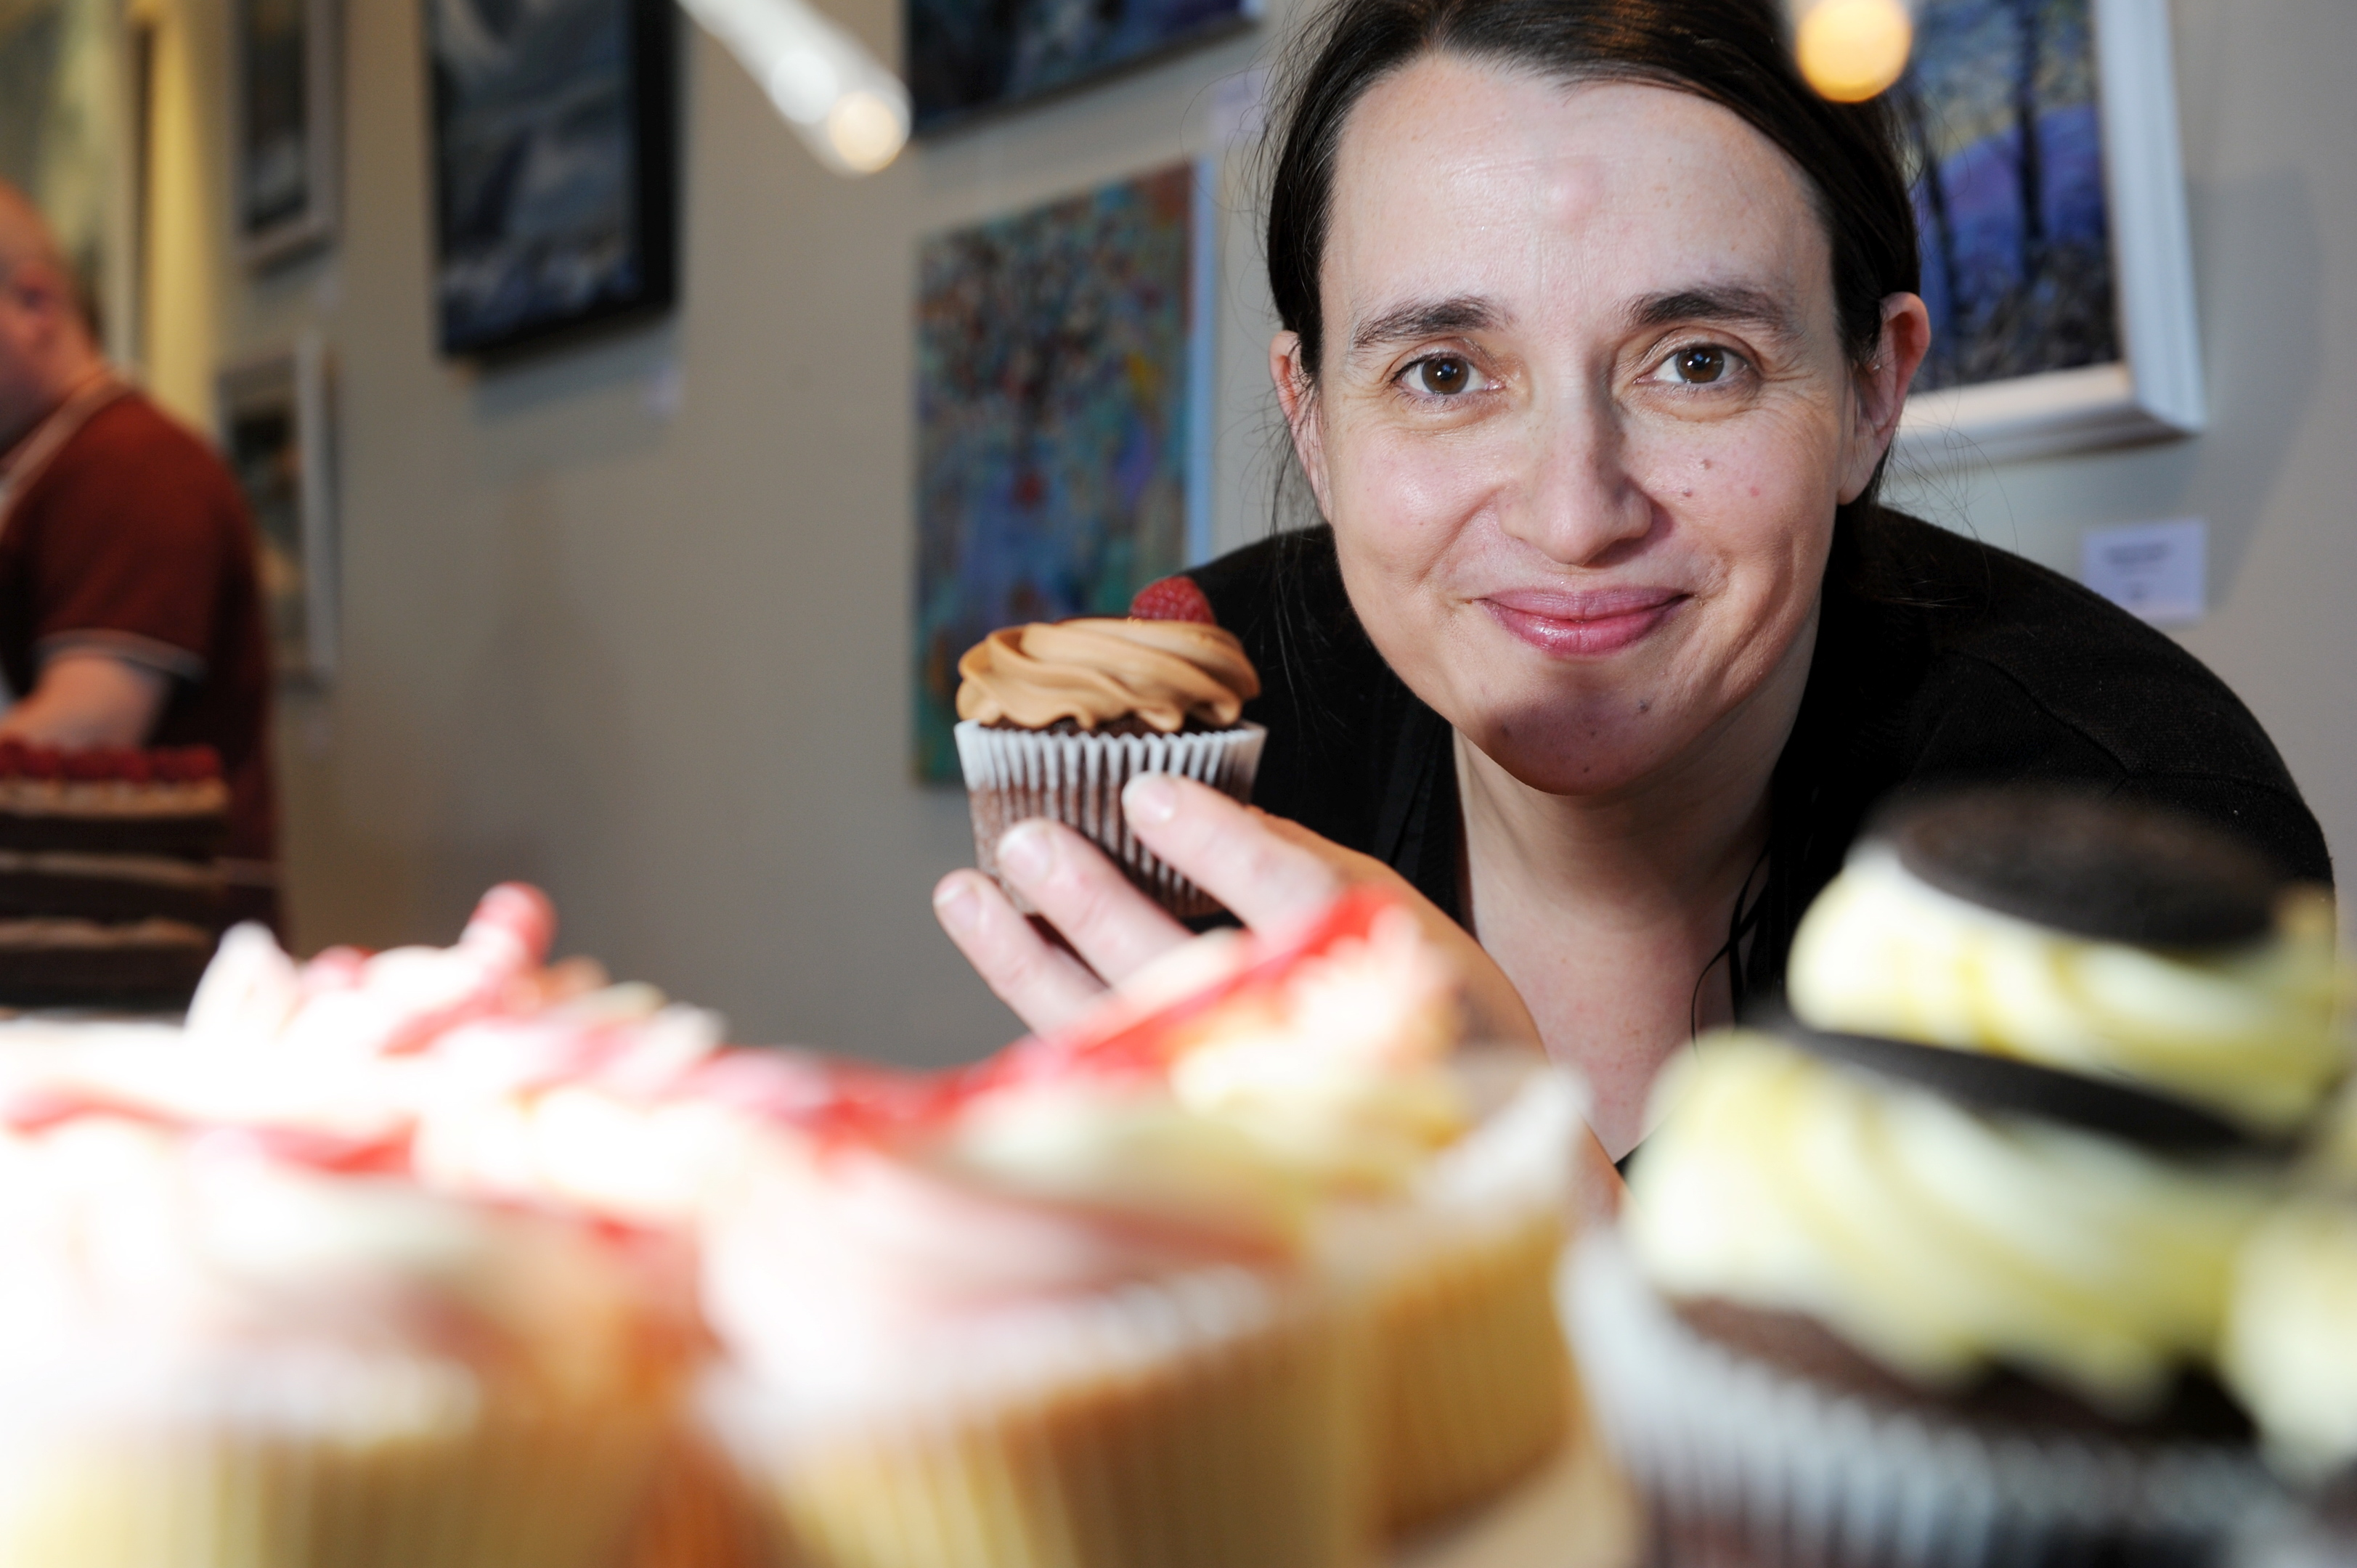 Jeni Hardie of Bad Girl Bakery